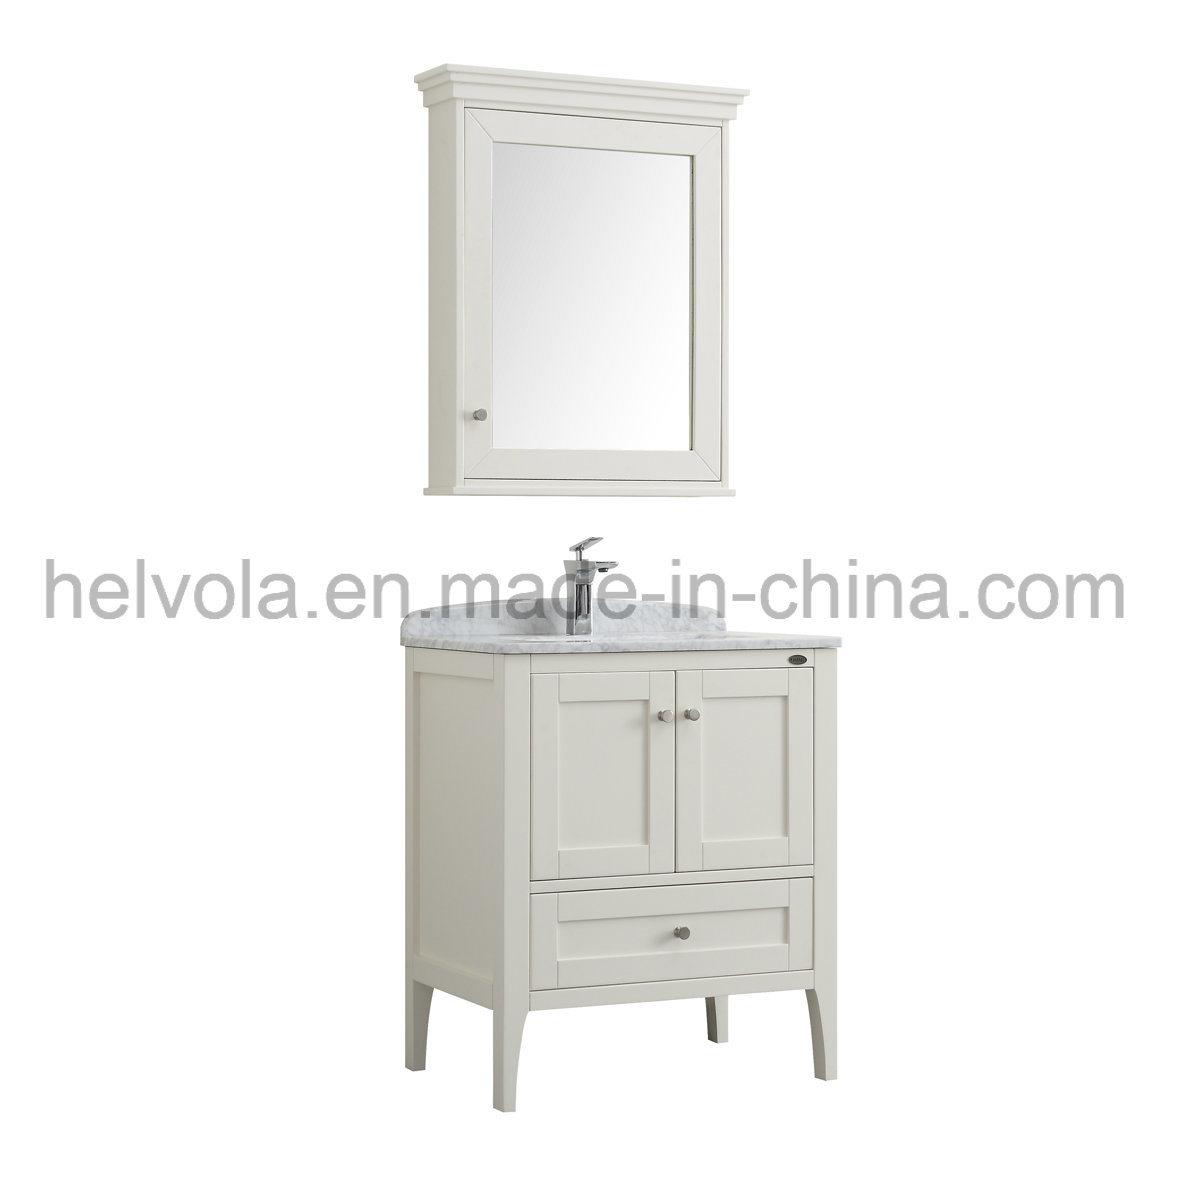 China Sanitary Ware Bathroom Basin Accessories Cabinet Solid Wood ...